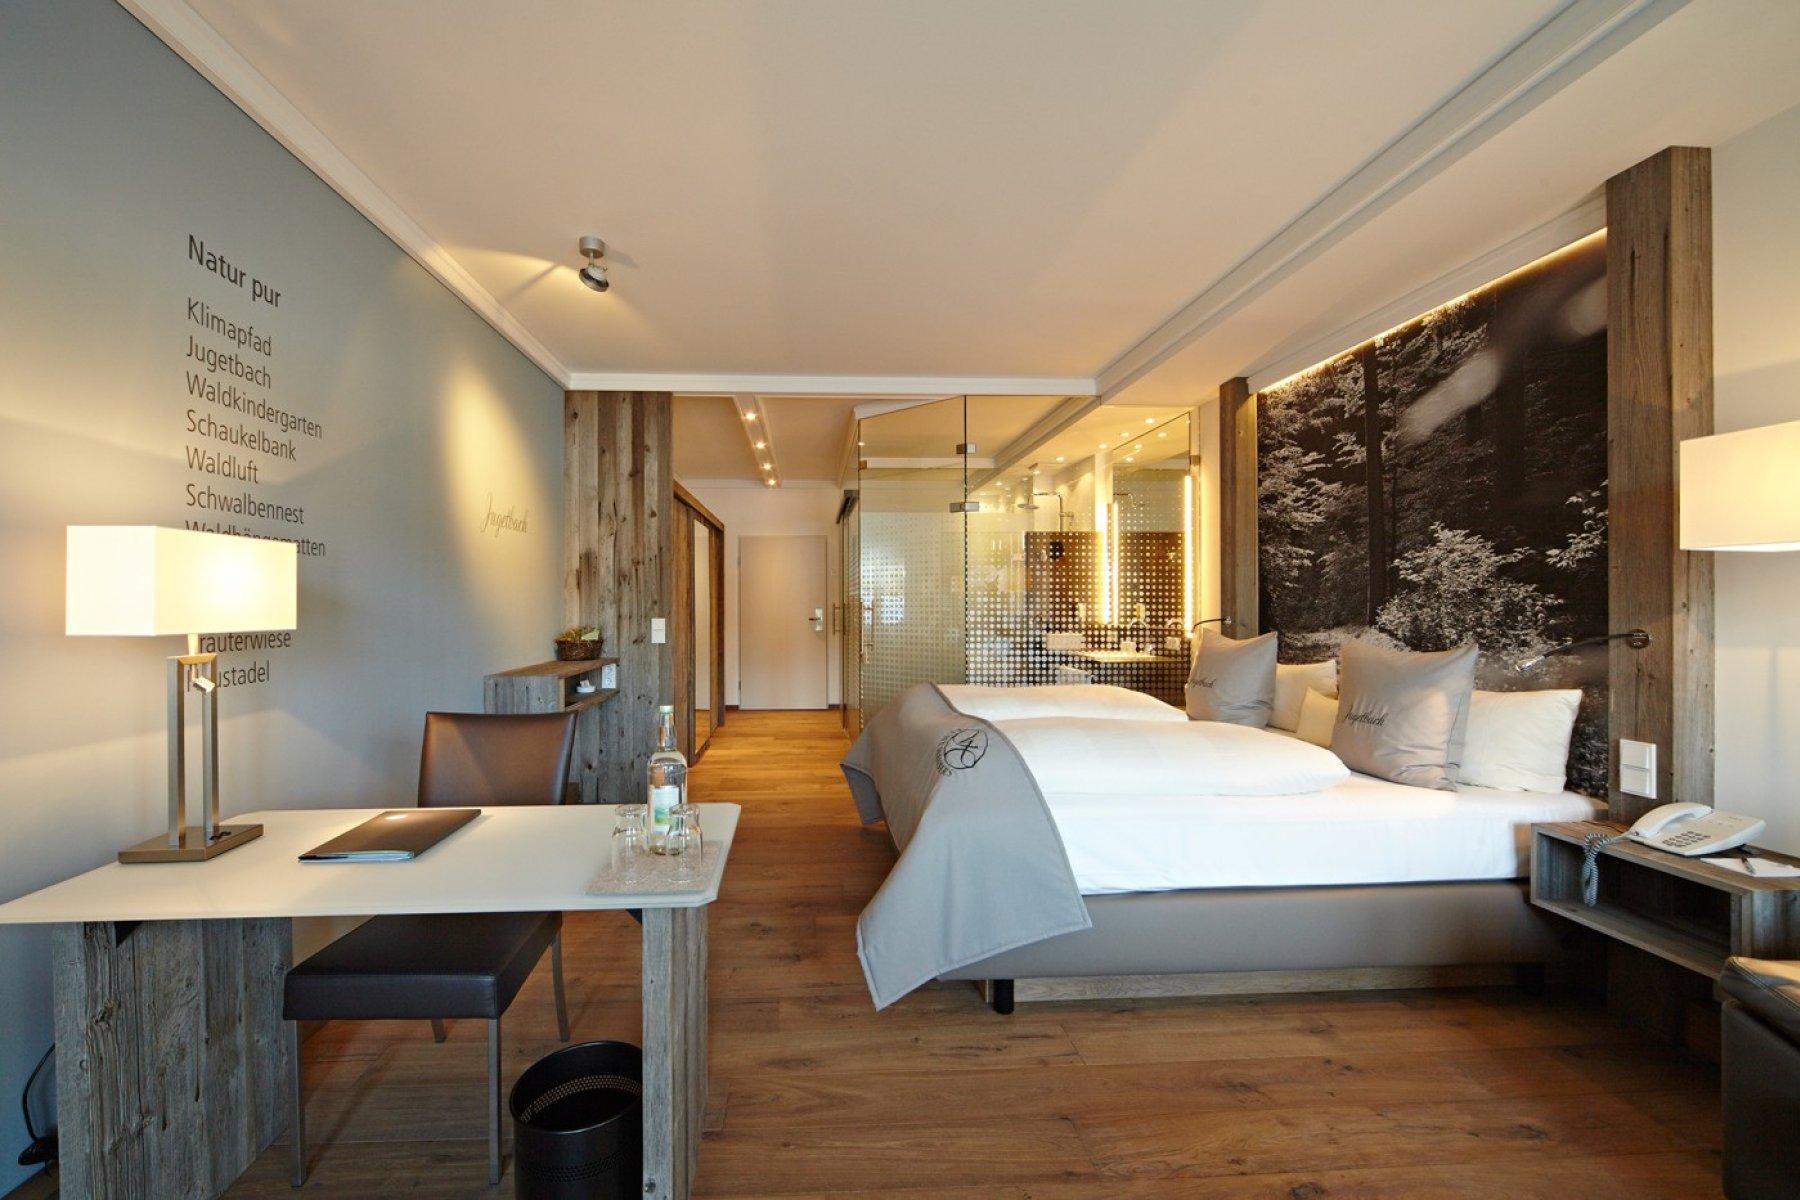 Großzügig, klares Design, hoher Wohnkomfort